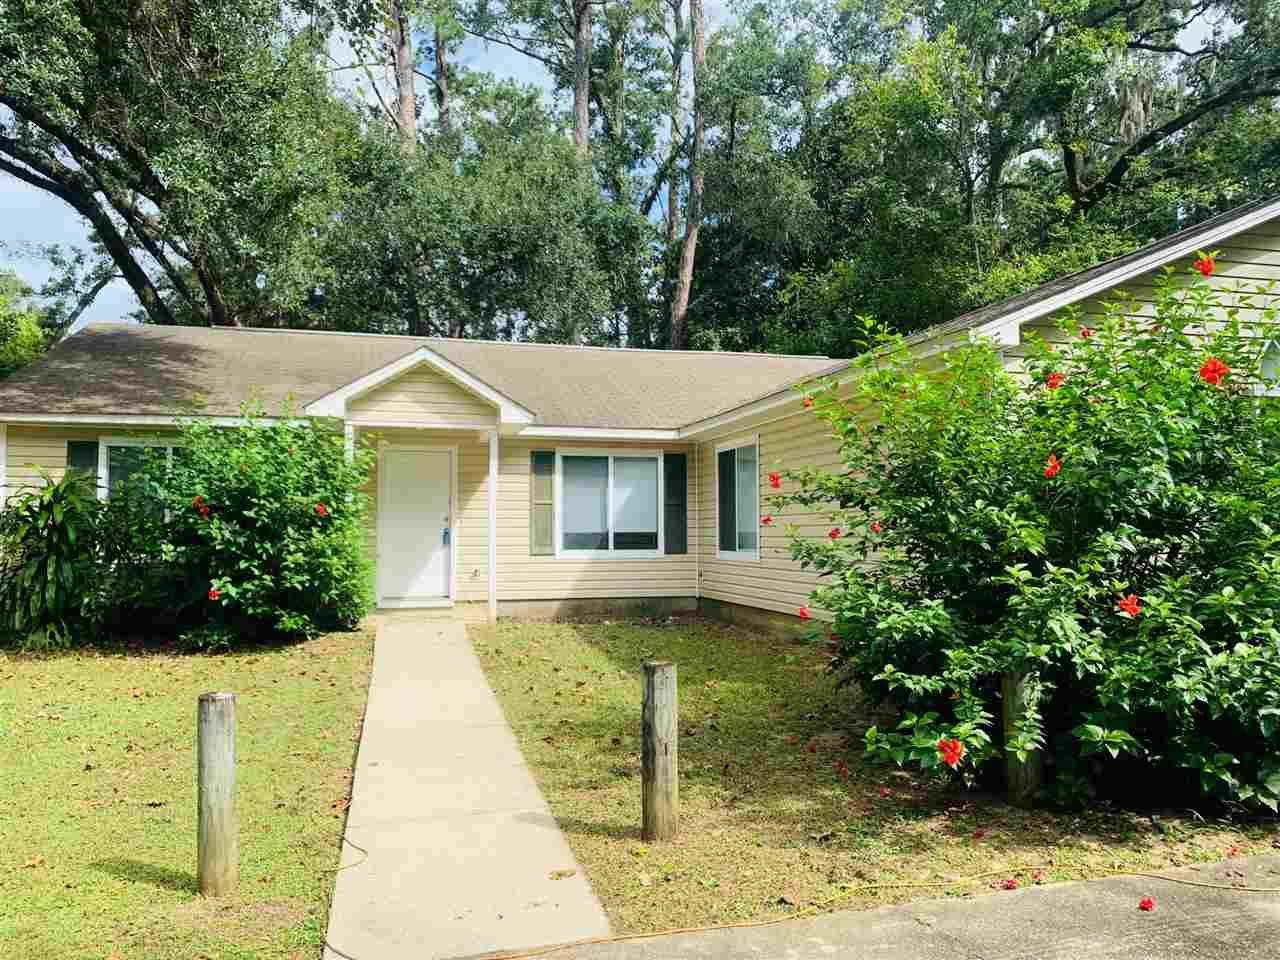 2328 Amelia Circle, Tallahassee, FL 32303 - MLS#: 323991